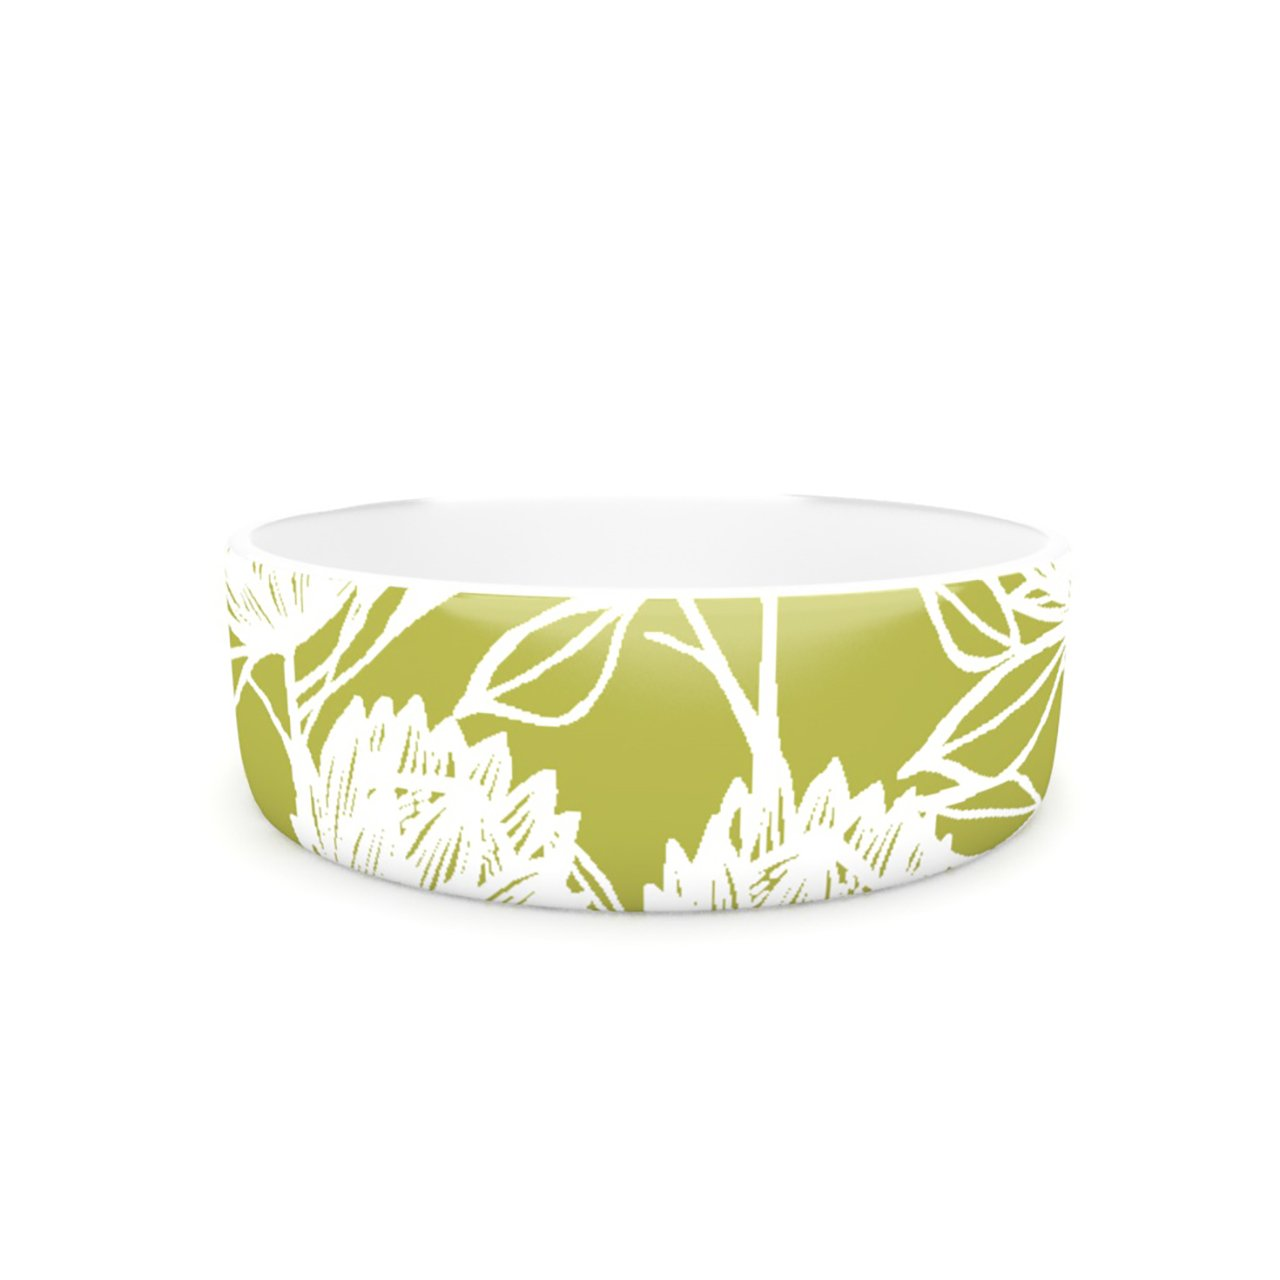 Kess InHouse Gill Eggleston Predea Olive White  Pet Bowl, 7-Inch, Green Flowers